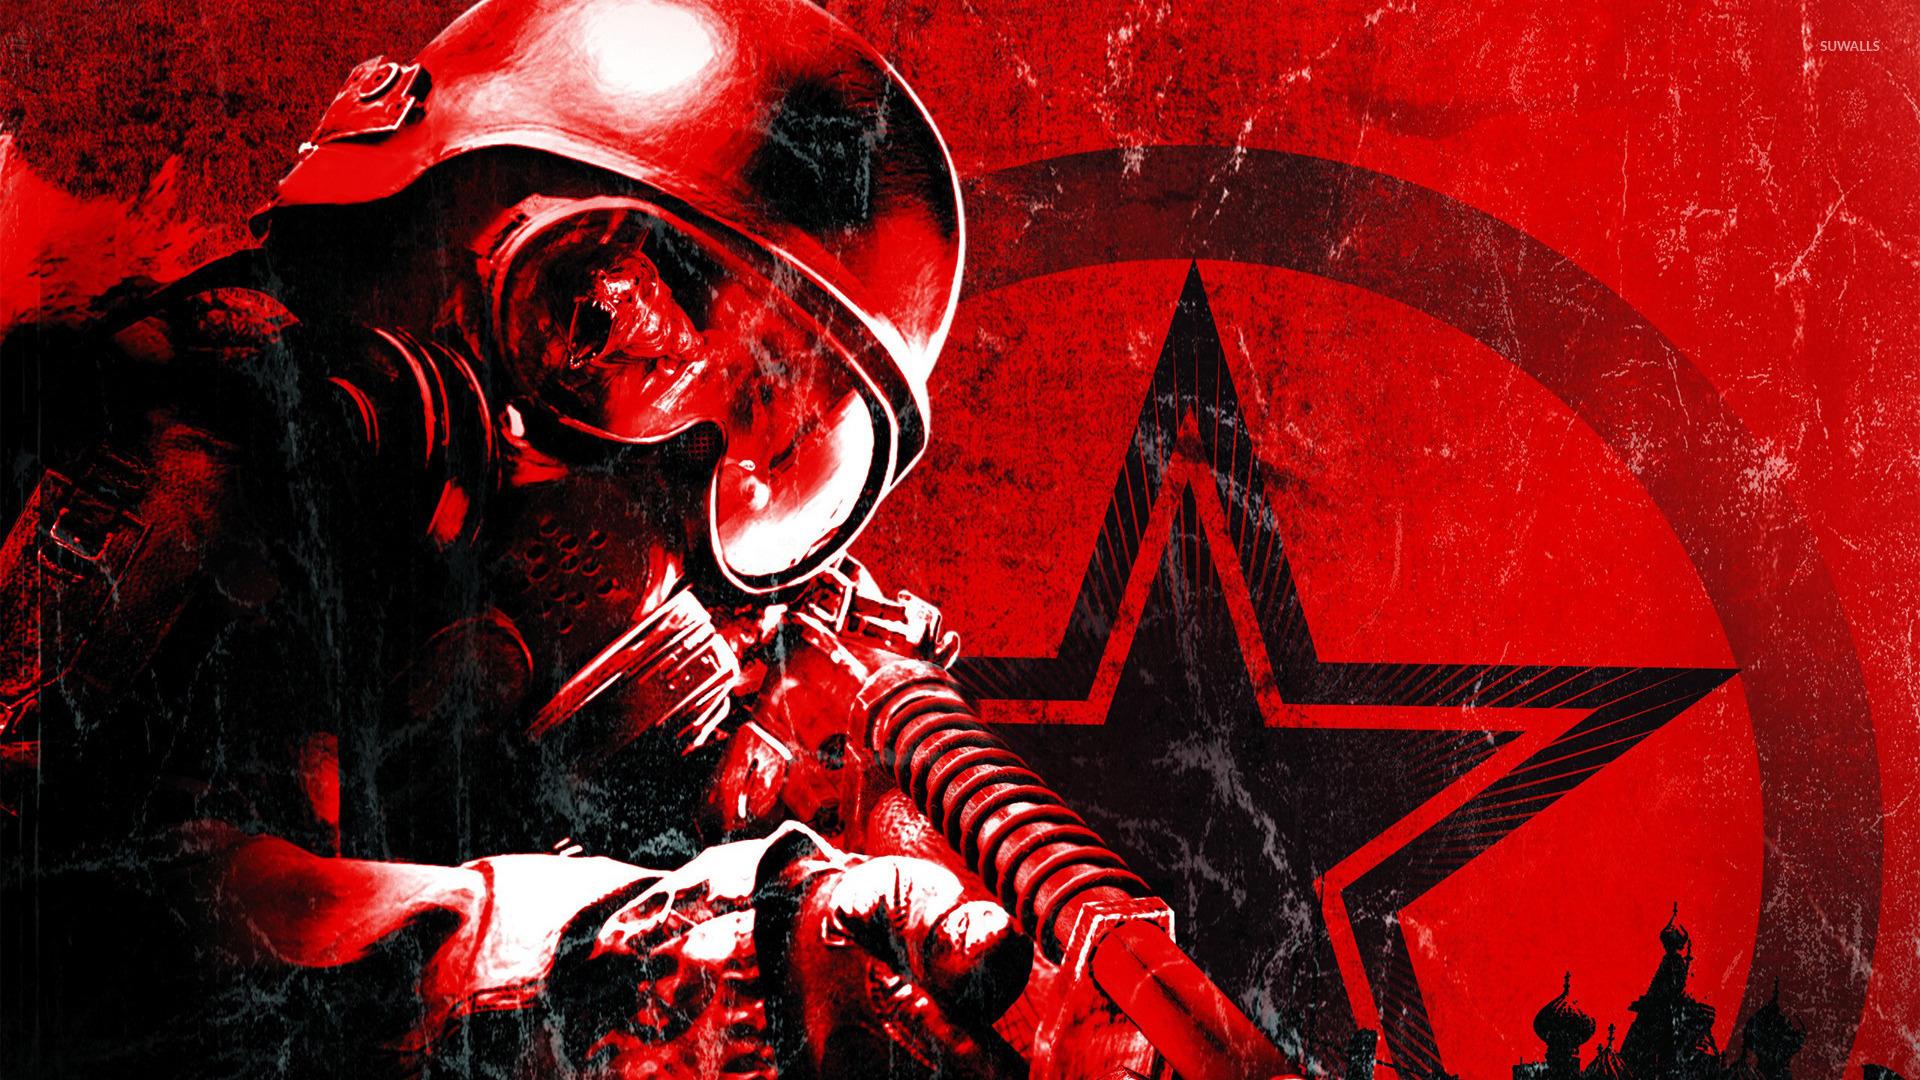 metro 2033 wallpaper game wallpapers 18246